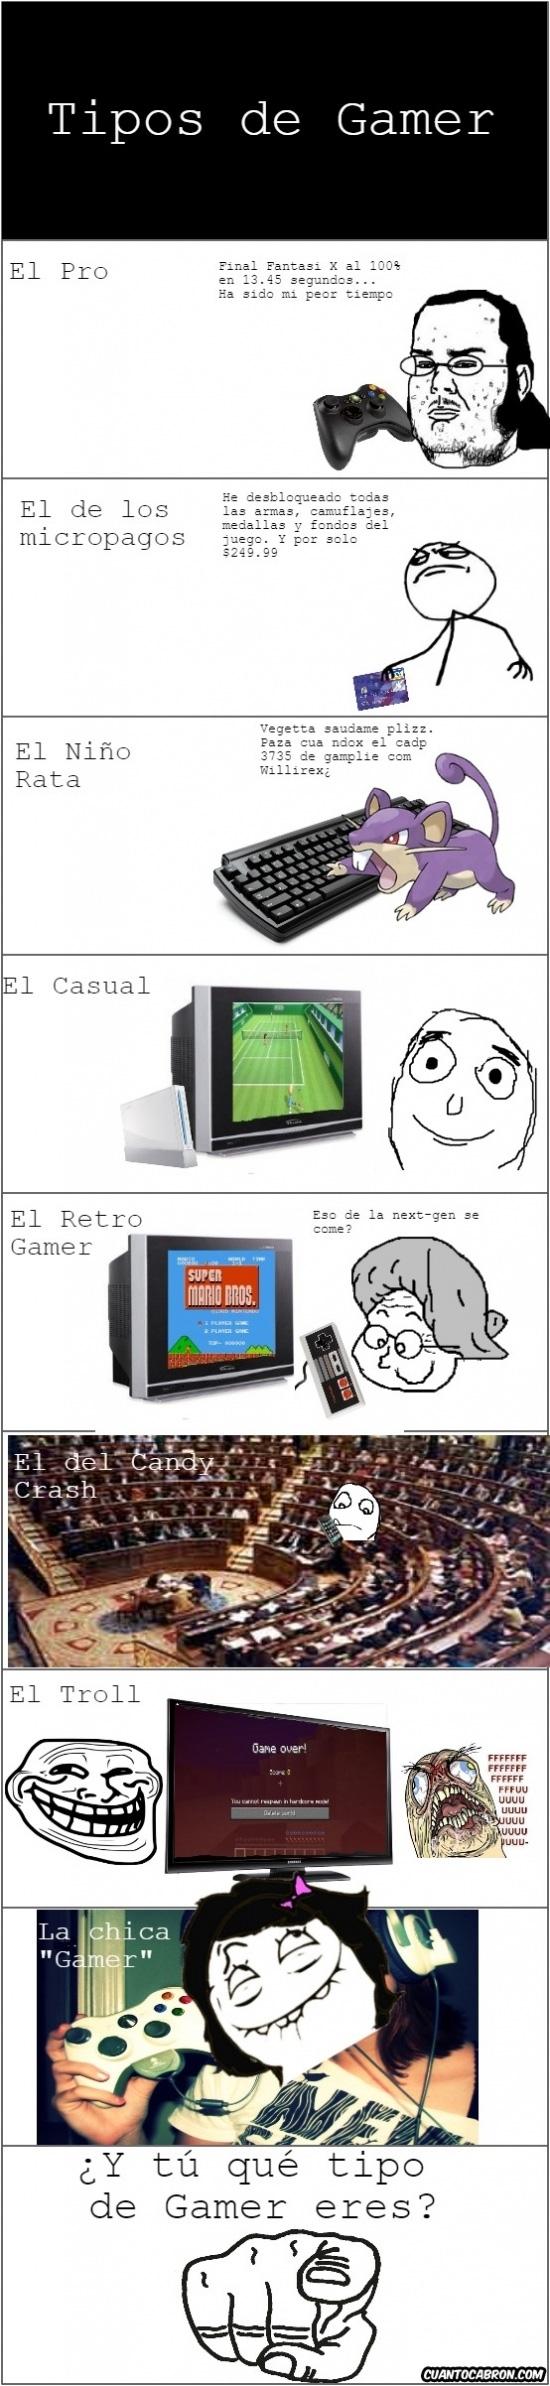 Friki - Tipos de gamer